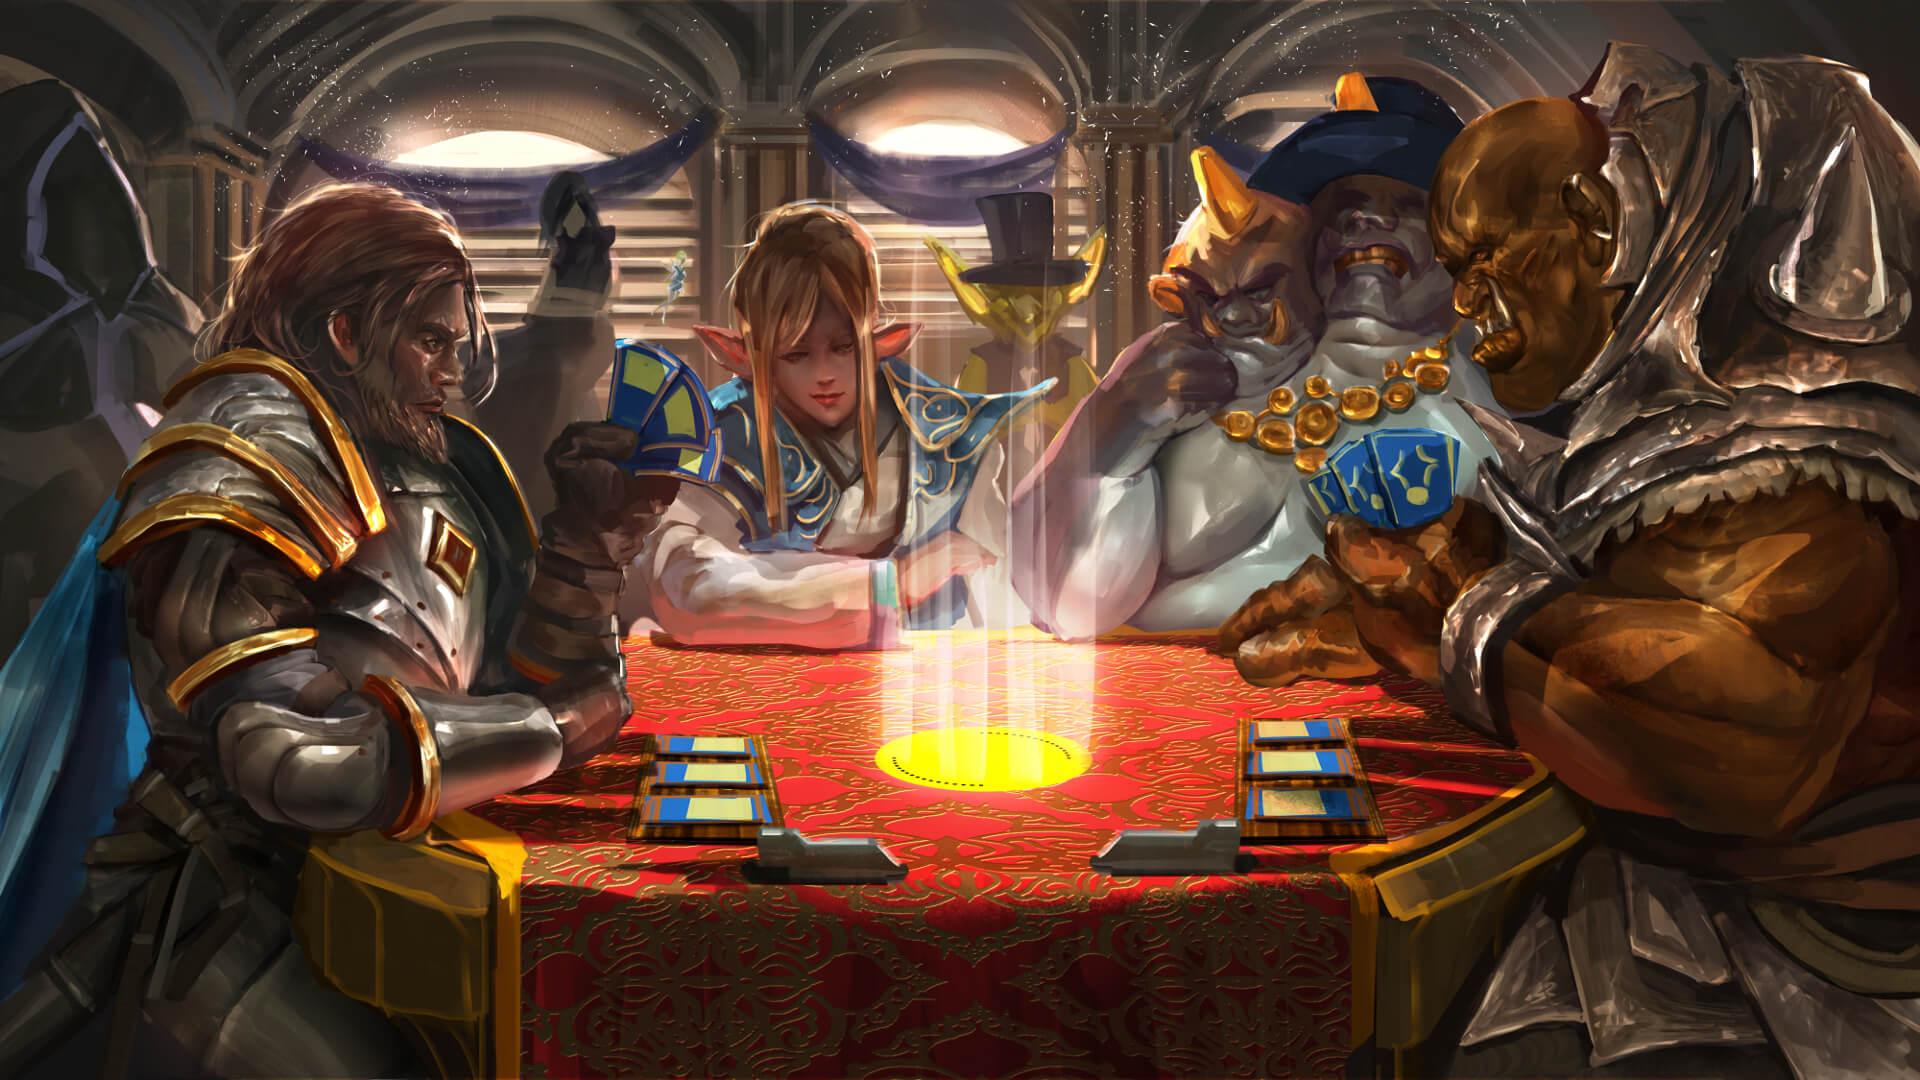 Legends of Code and Magic artwork